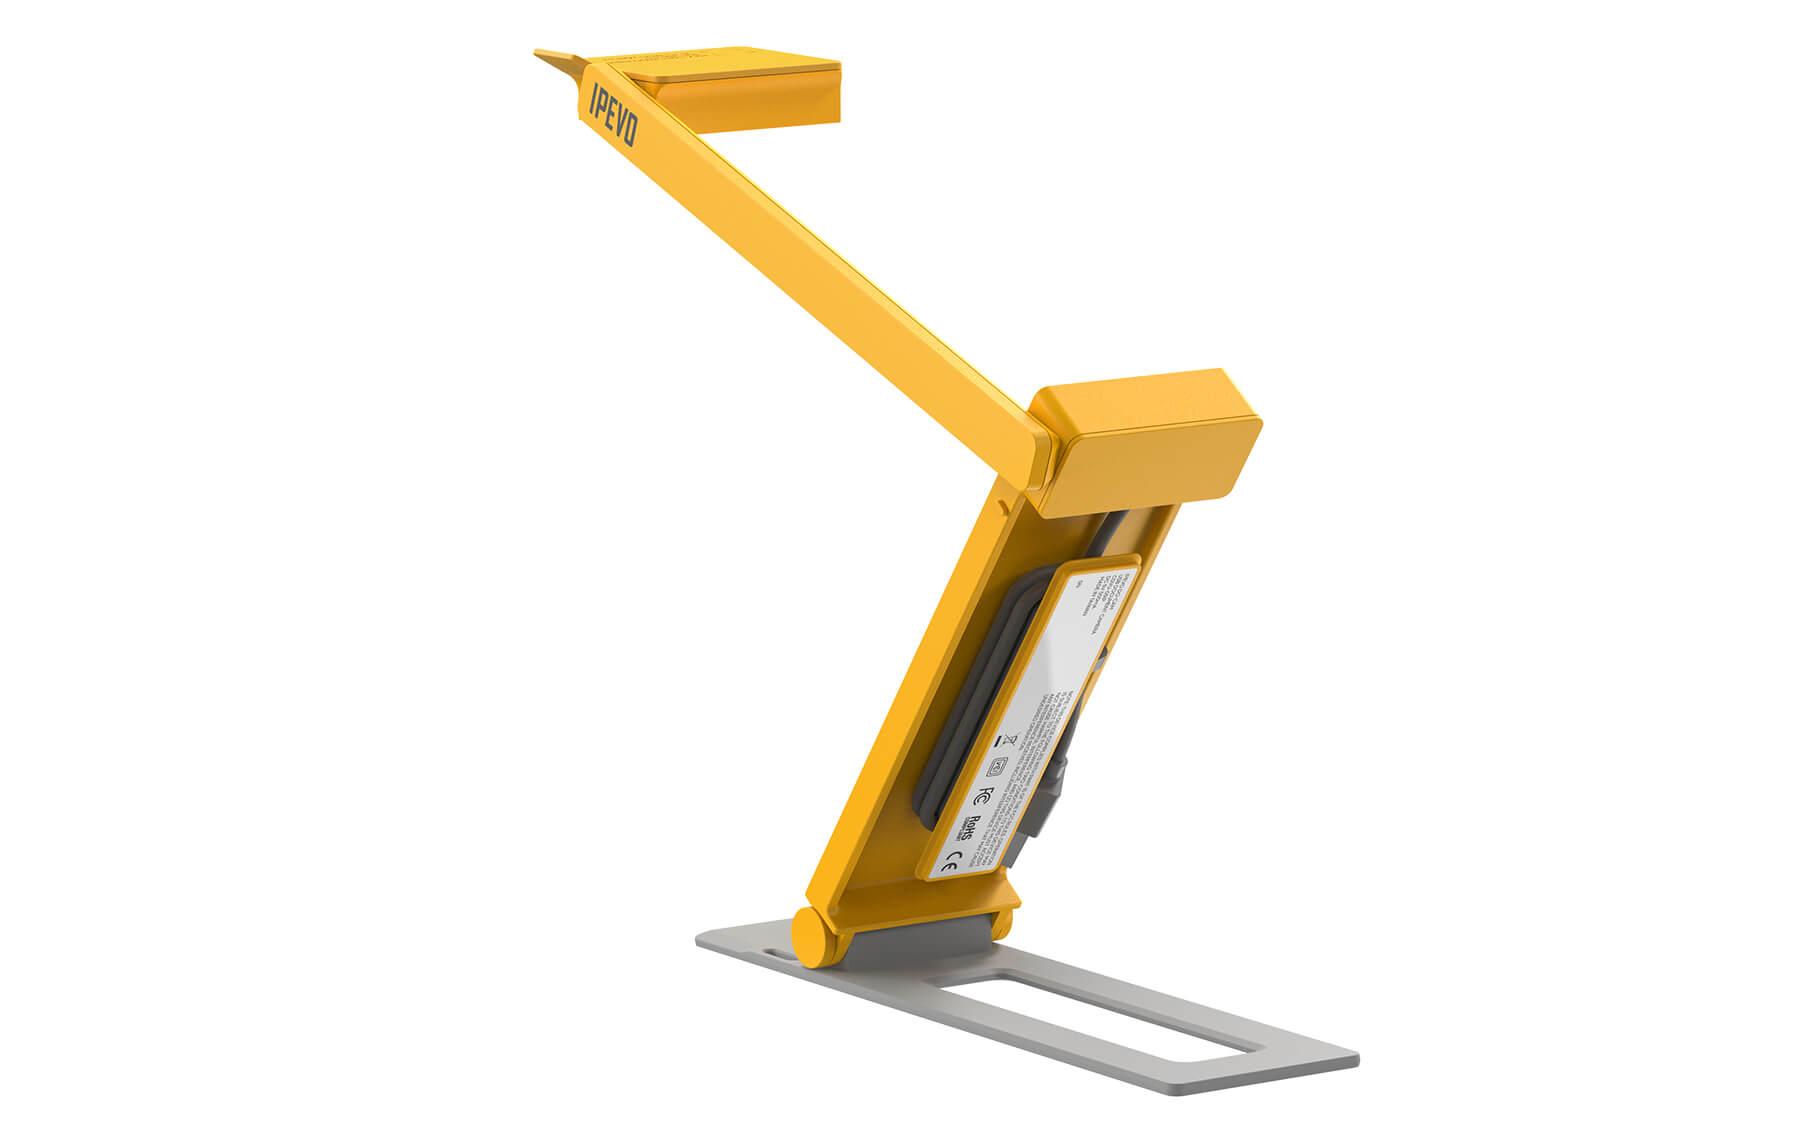 IPEVO DO-CAM Creator's Edition USB Visualiser Gallery photo 4